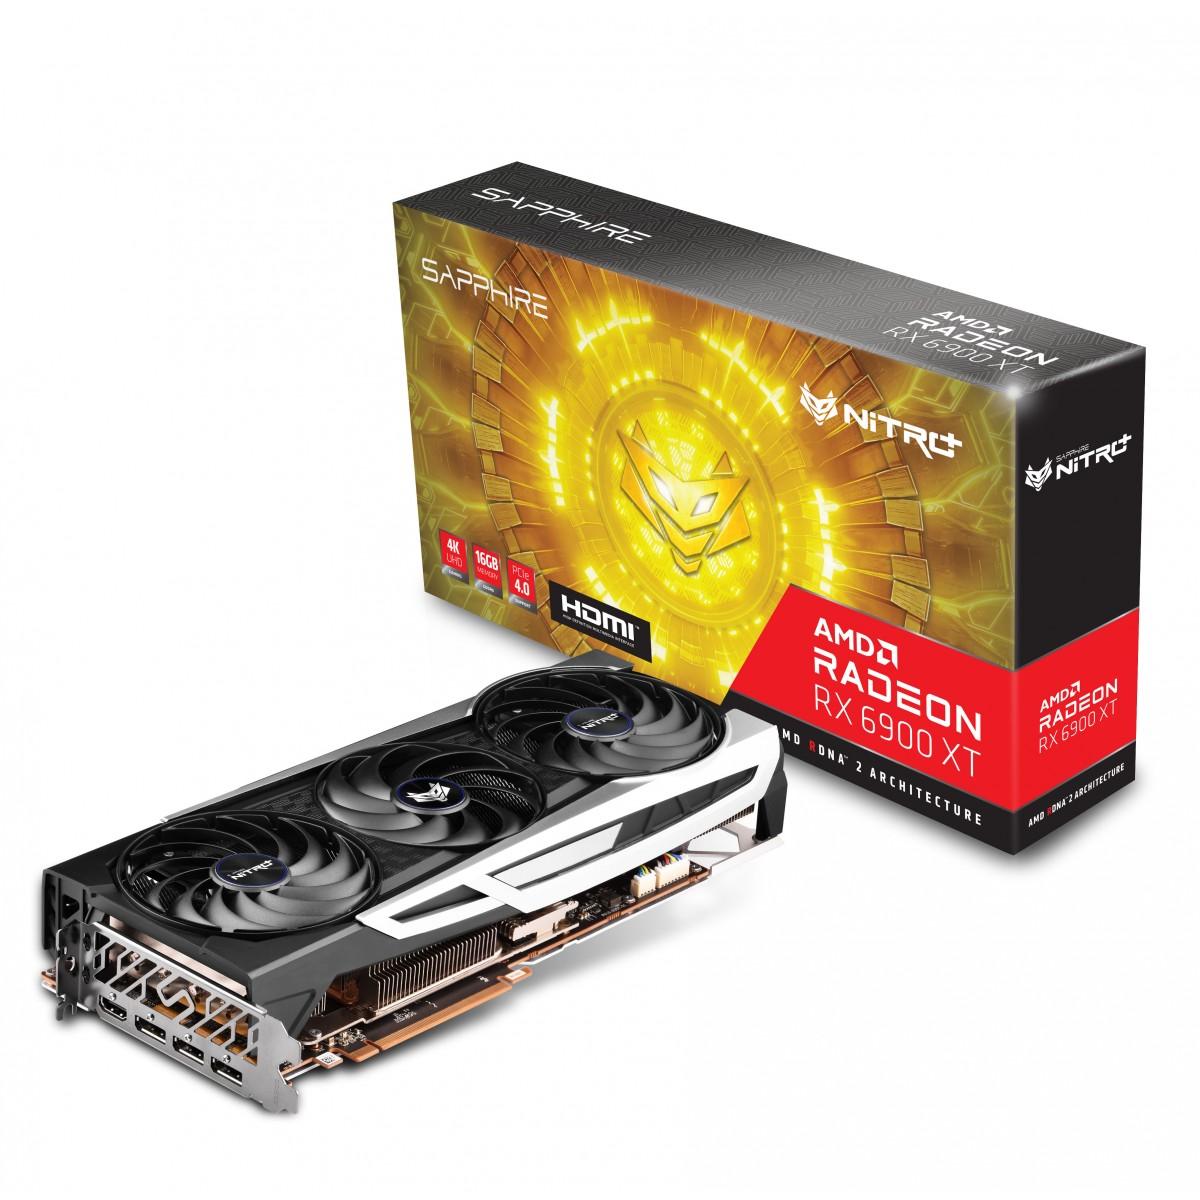 Placa de Vídeo Sapphire Radeon Nitro+ AMD Radeon RX 6900 XT, 16GB, GDDR6, 256bit, 11308-01-20G